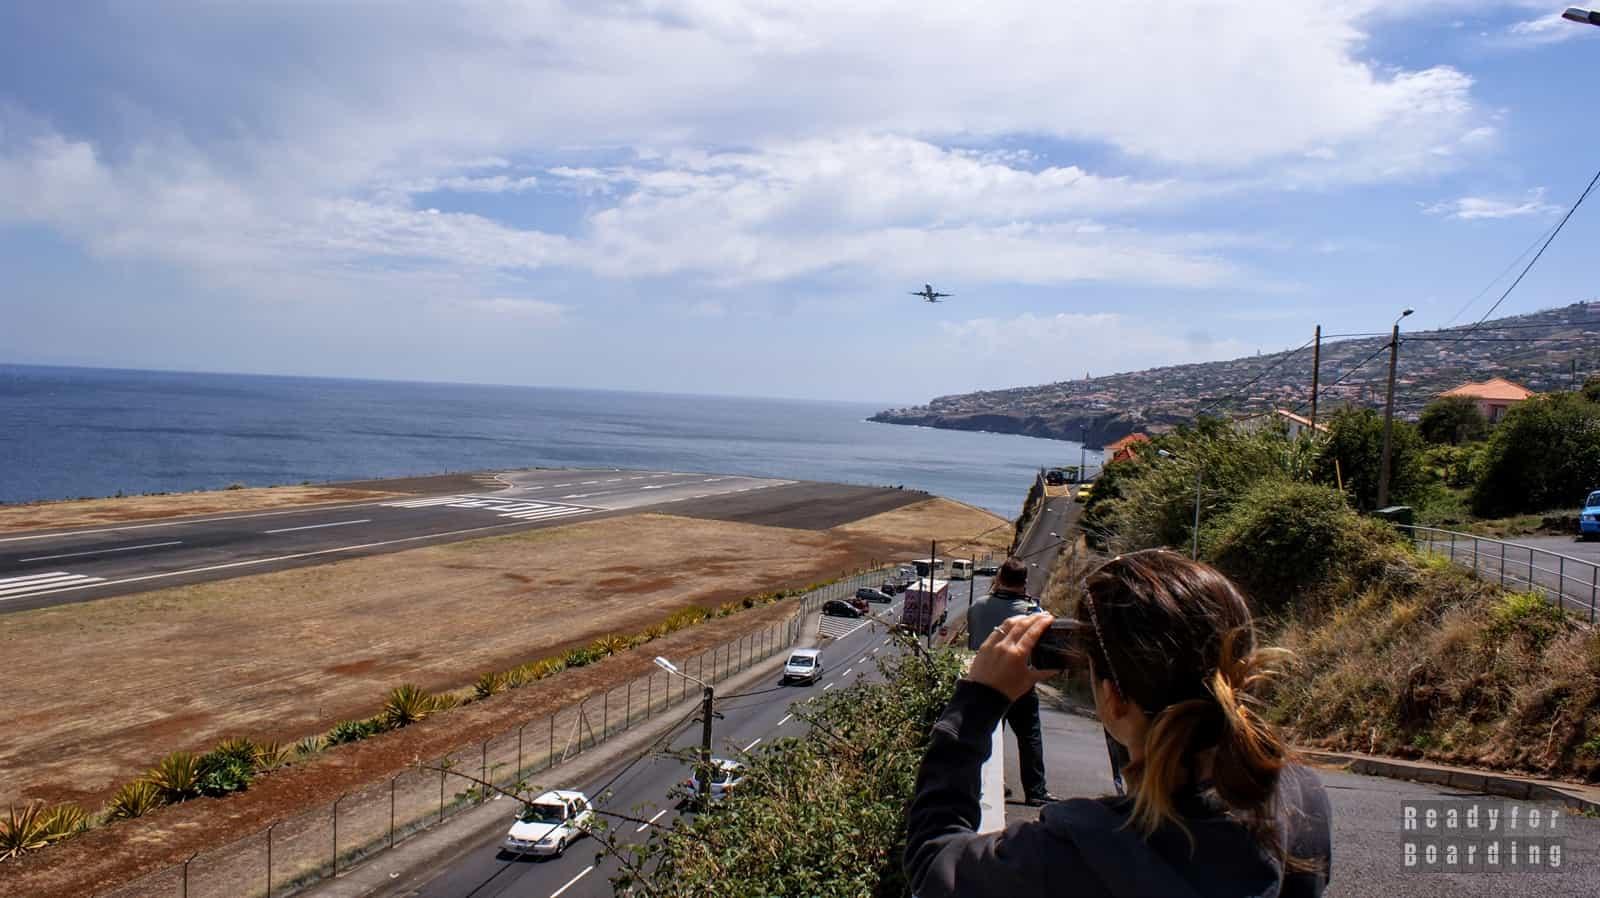 Madera - lotnisko (galeria zdjęć)